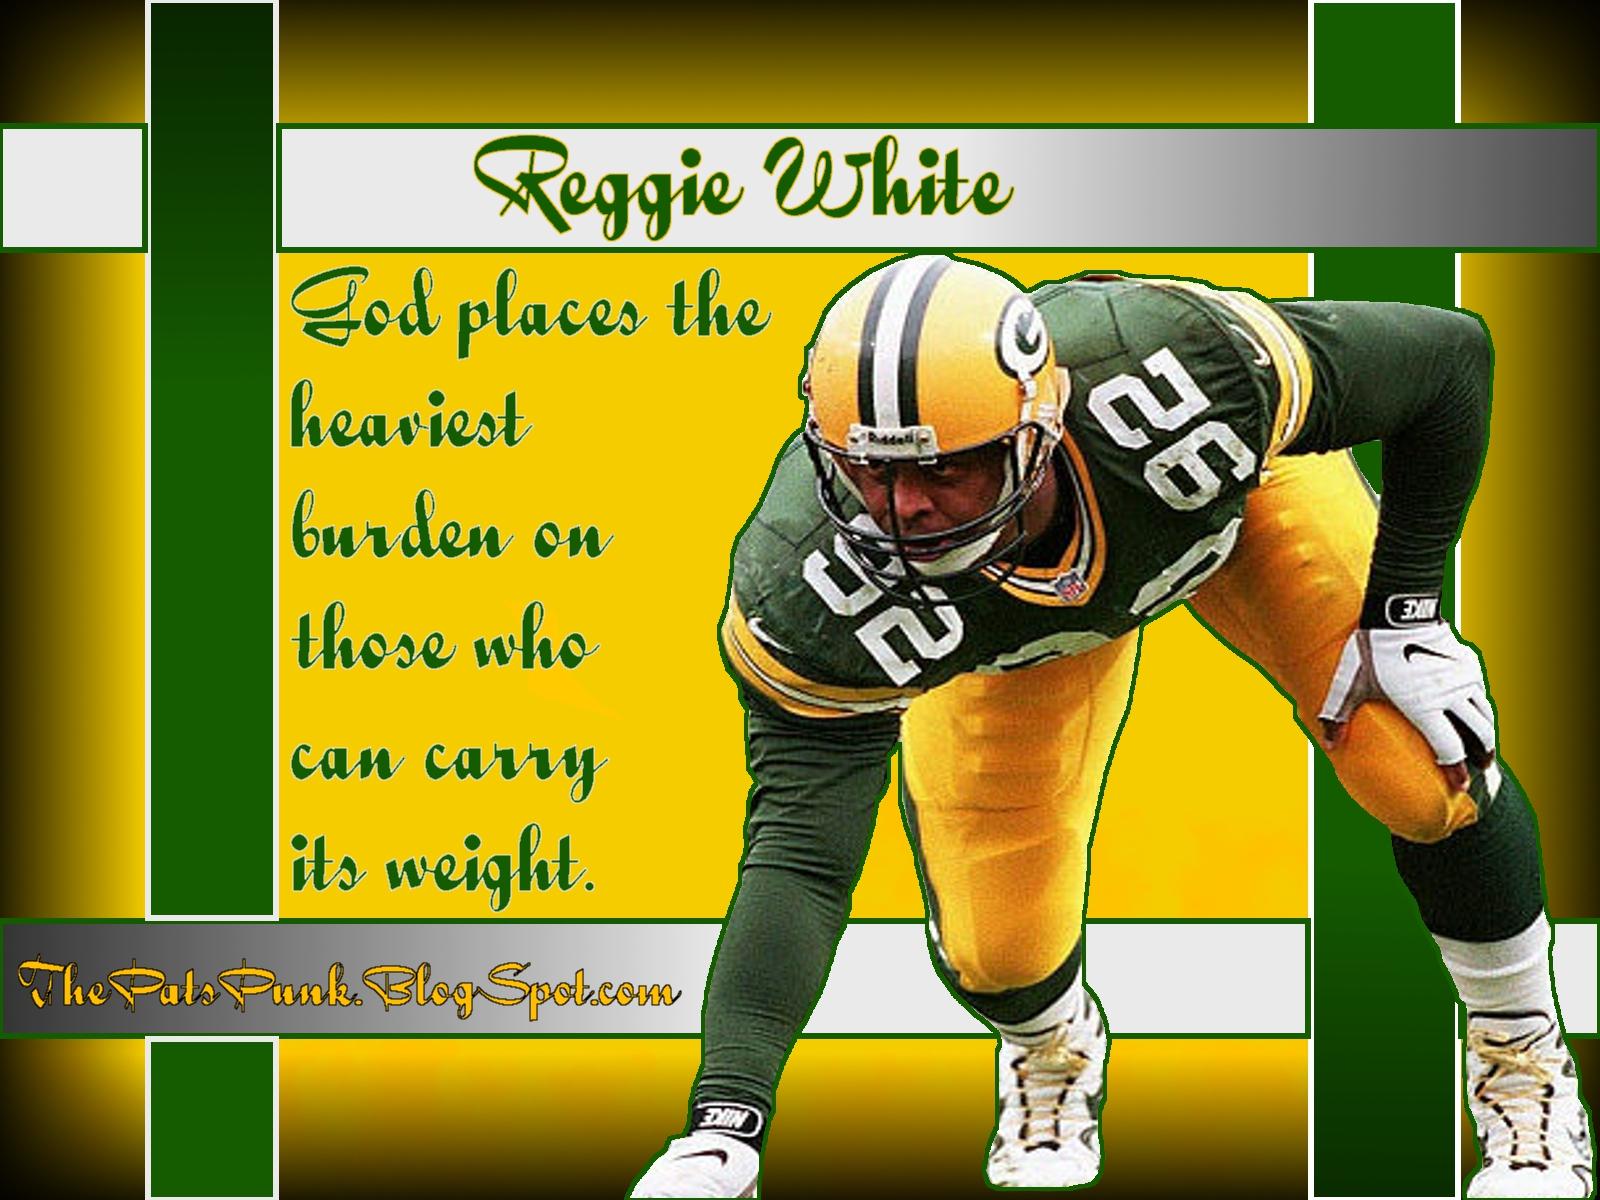 Reggie White's quote #1